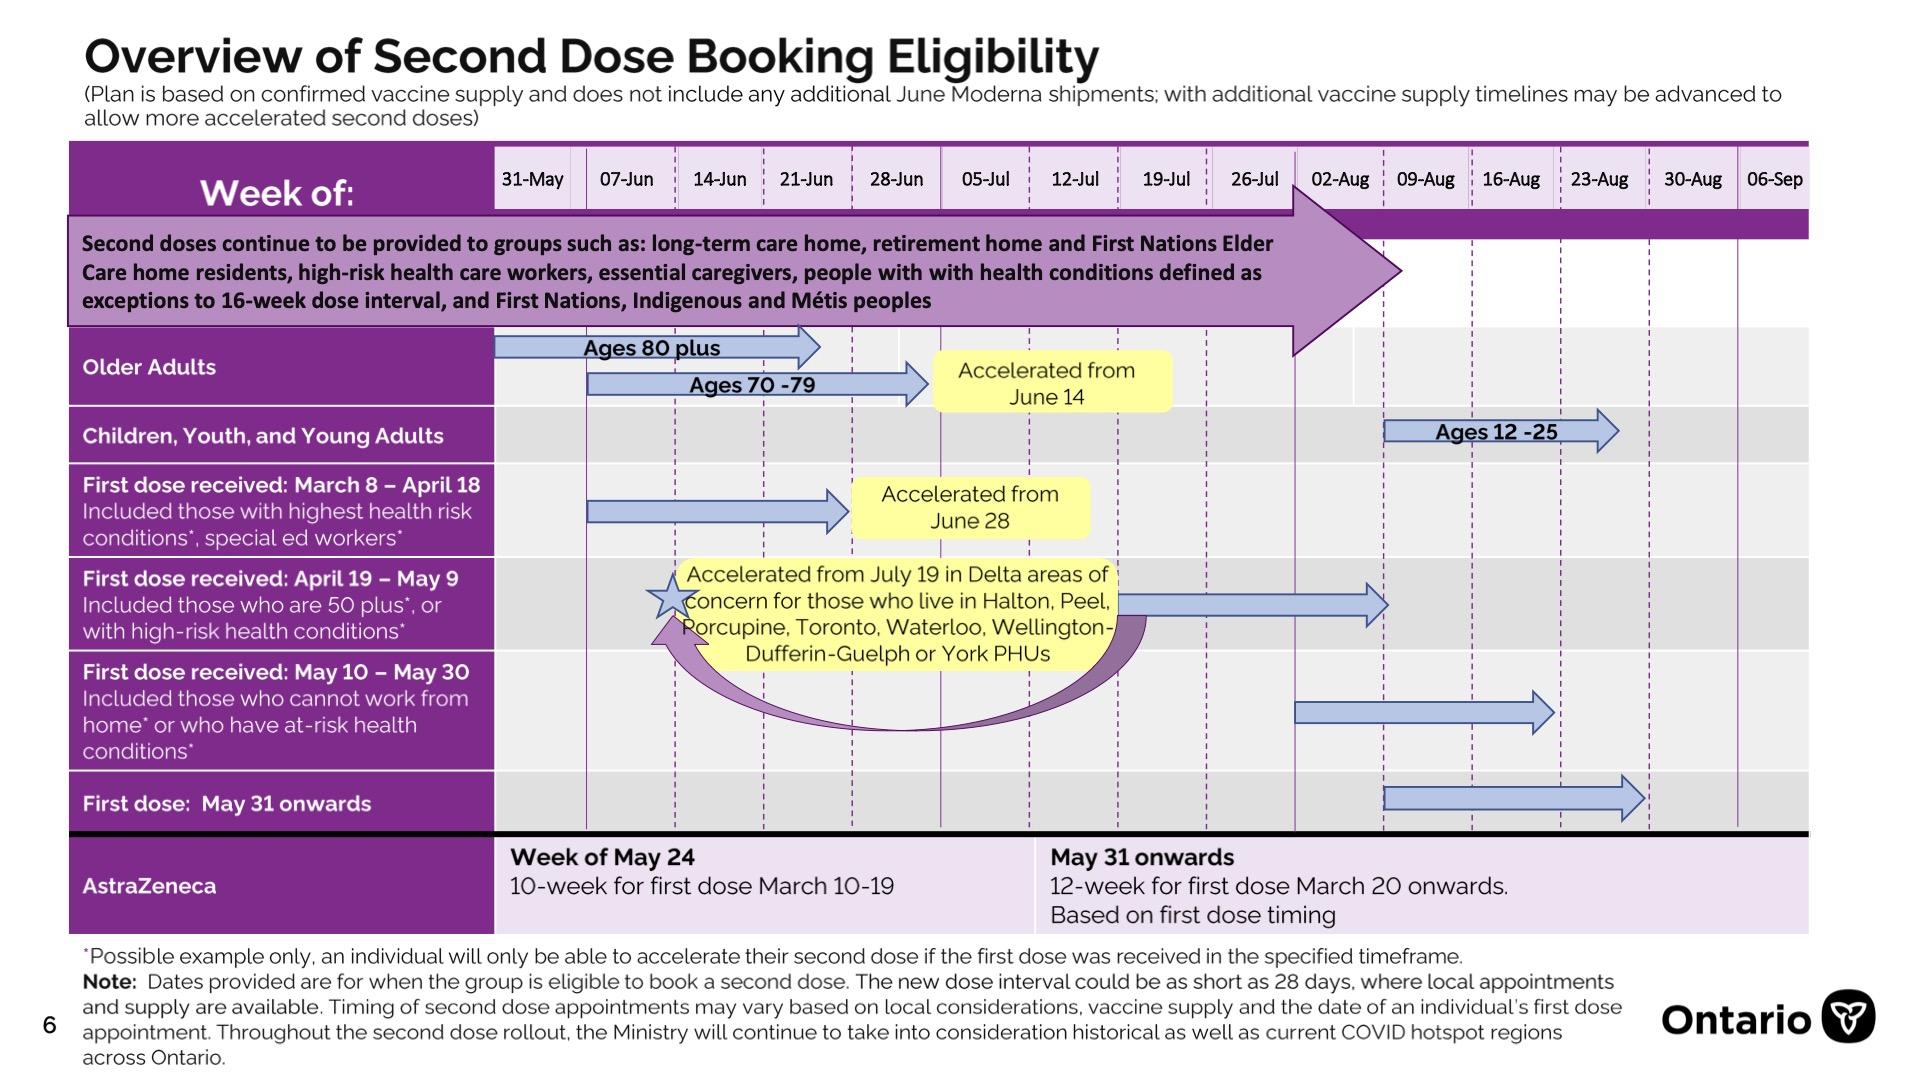 Vaccine second doses